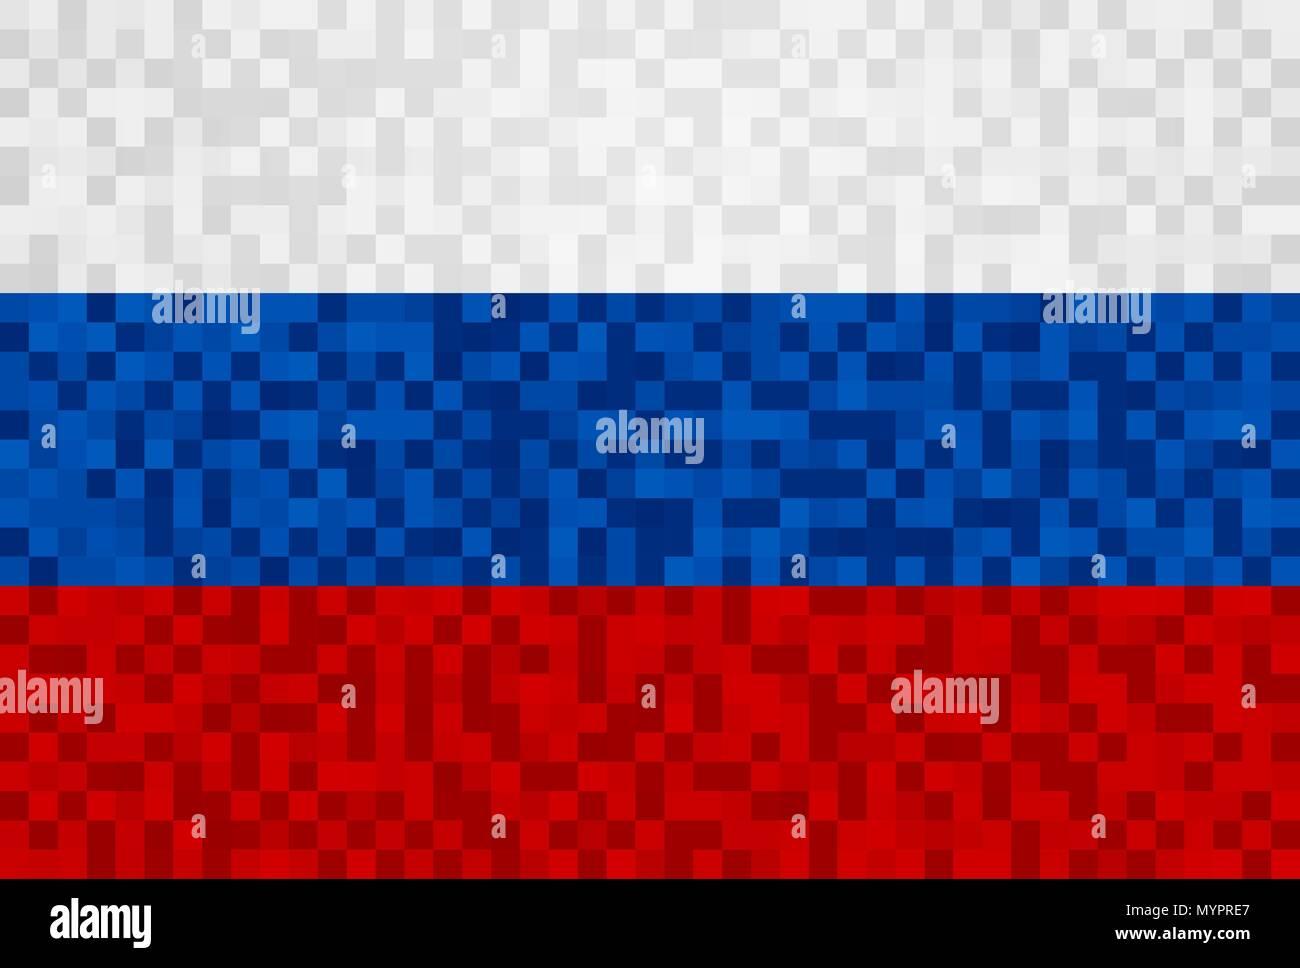 pixel art photos  u0026 pixel art images - page 9